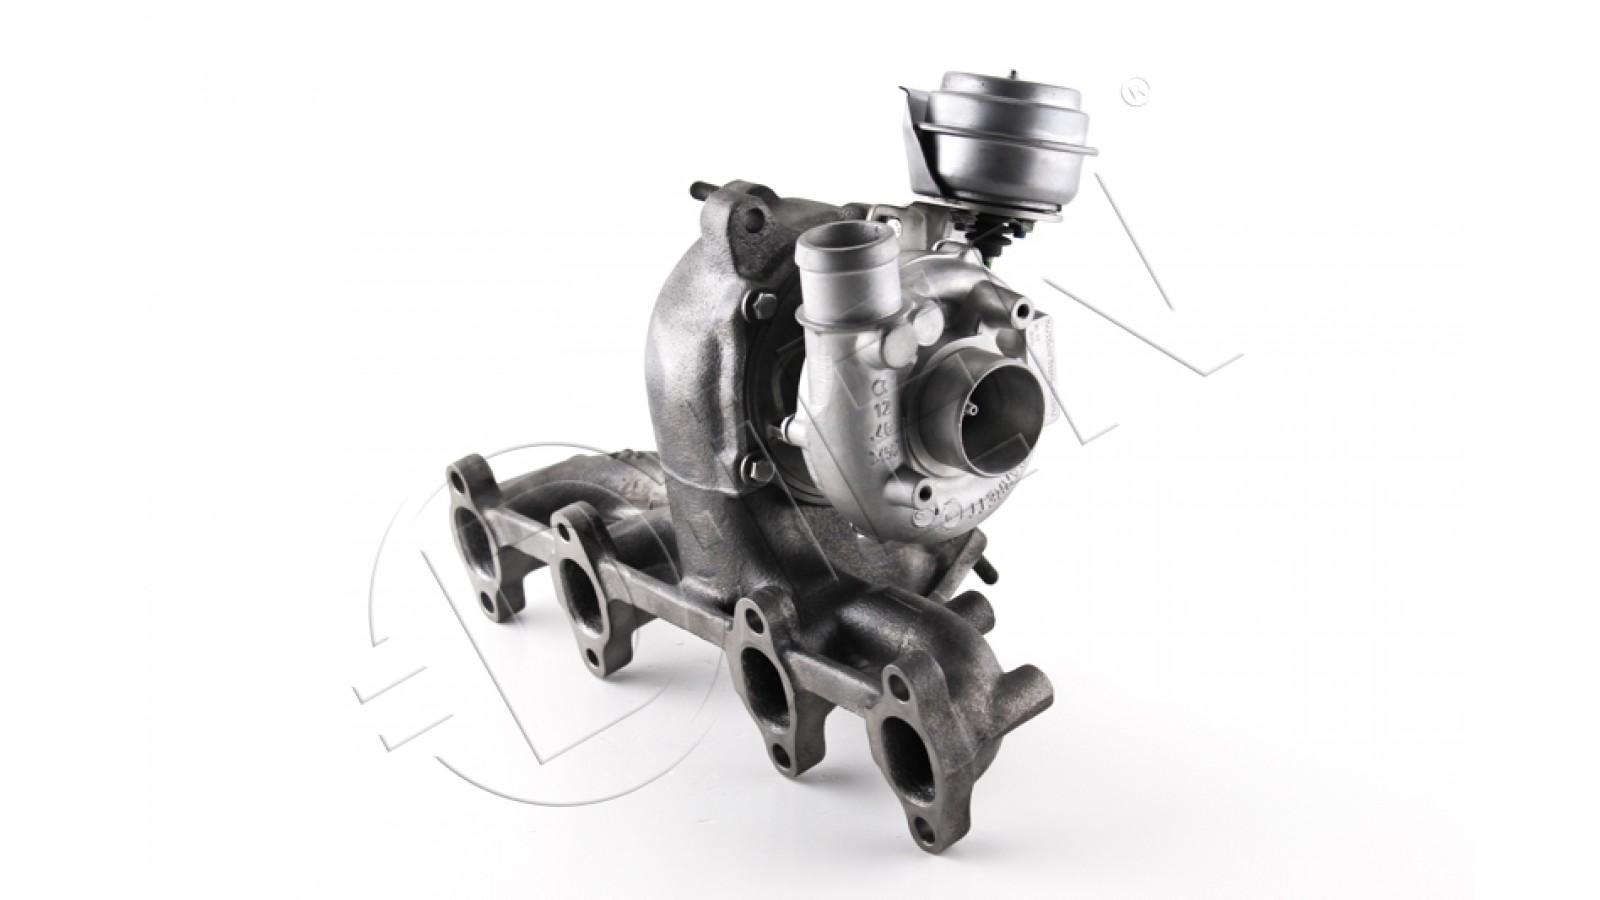 Turbocompressore  VOLKSWAGEN  GOLF IV  1.9 TDI  101Cv  1896ccm  set 2000 - giu 2005